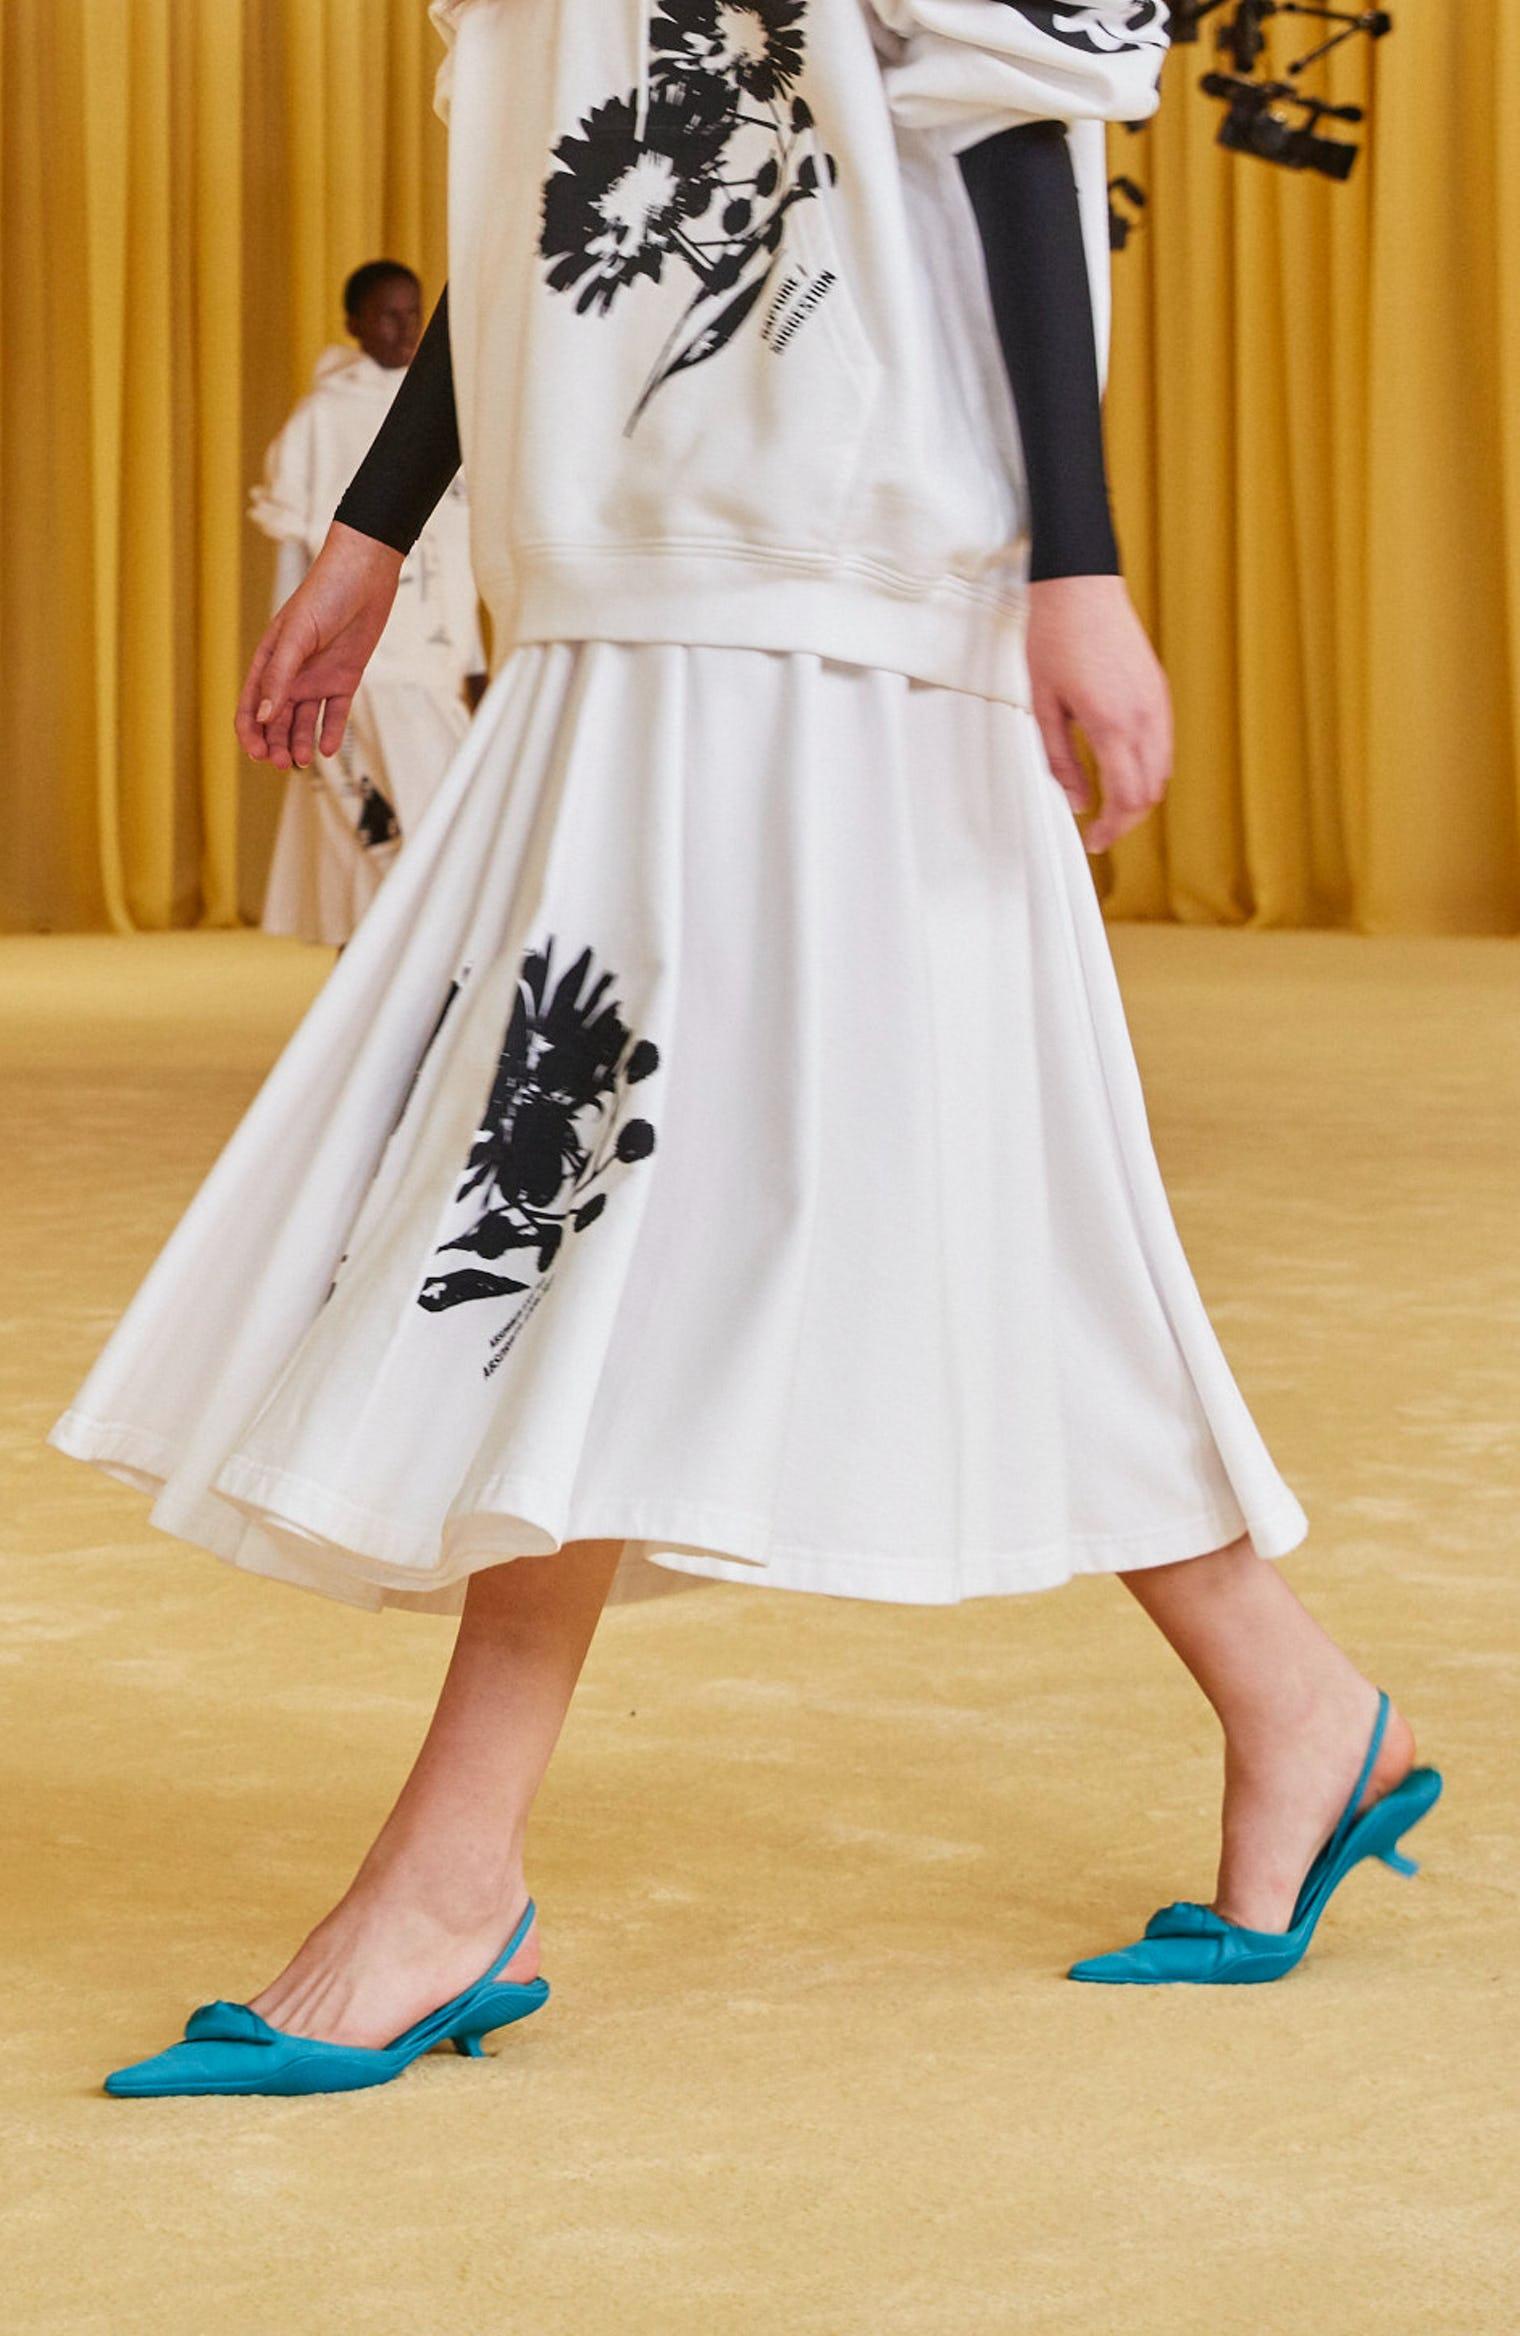 giày slingback xanh cổ vịt trong bst Prada x Raf Simon 2021